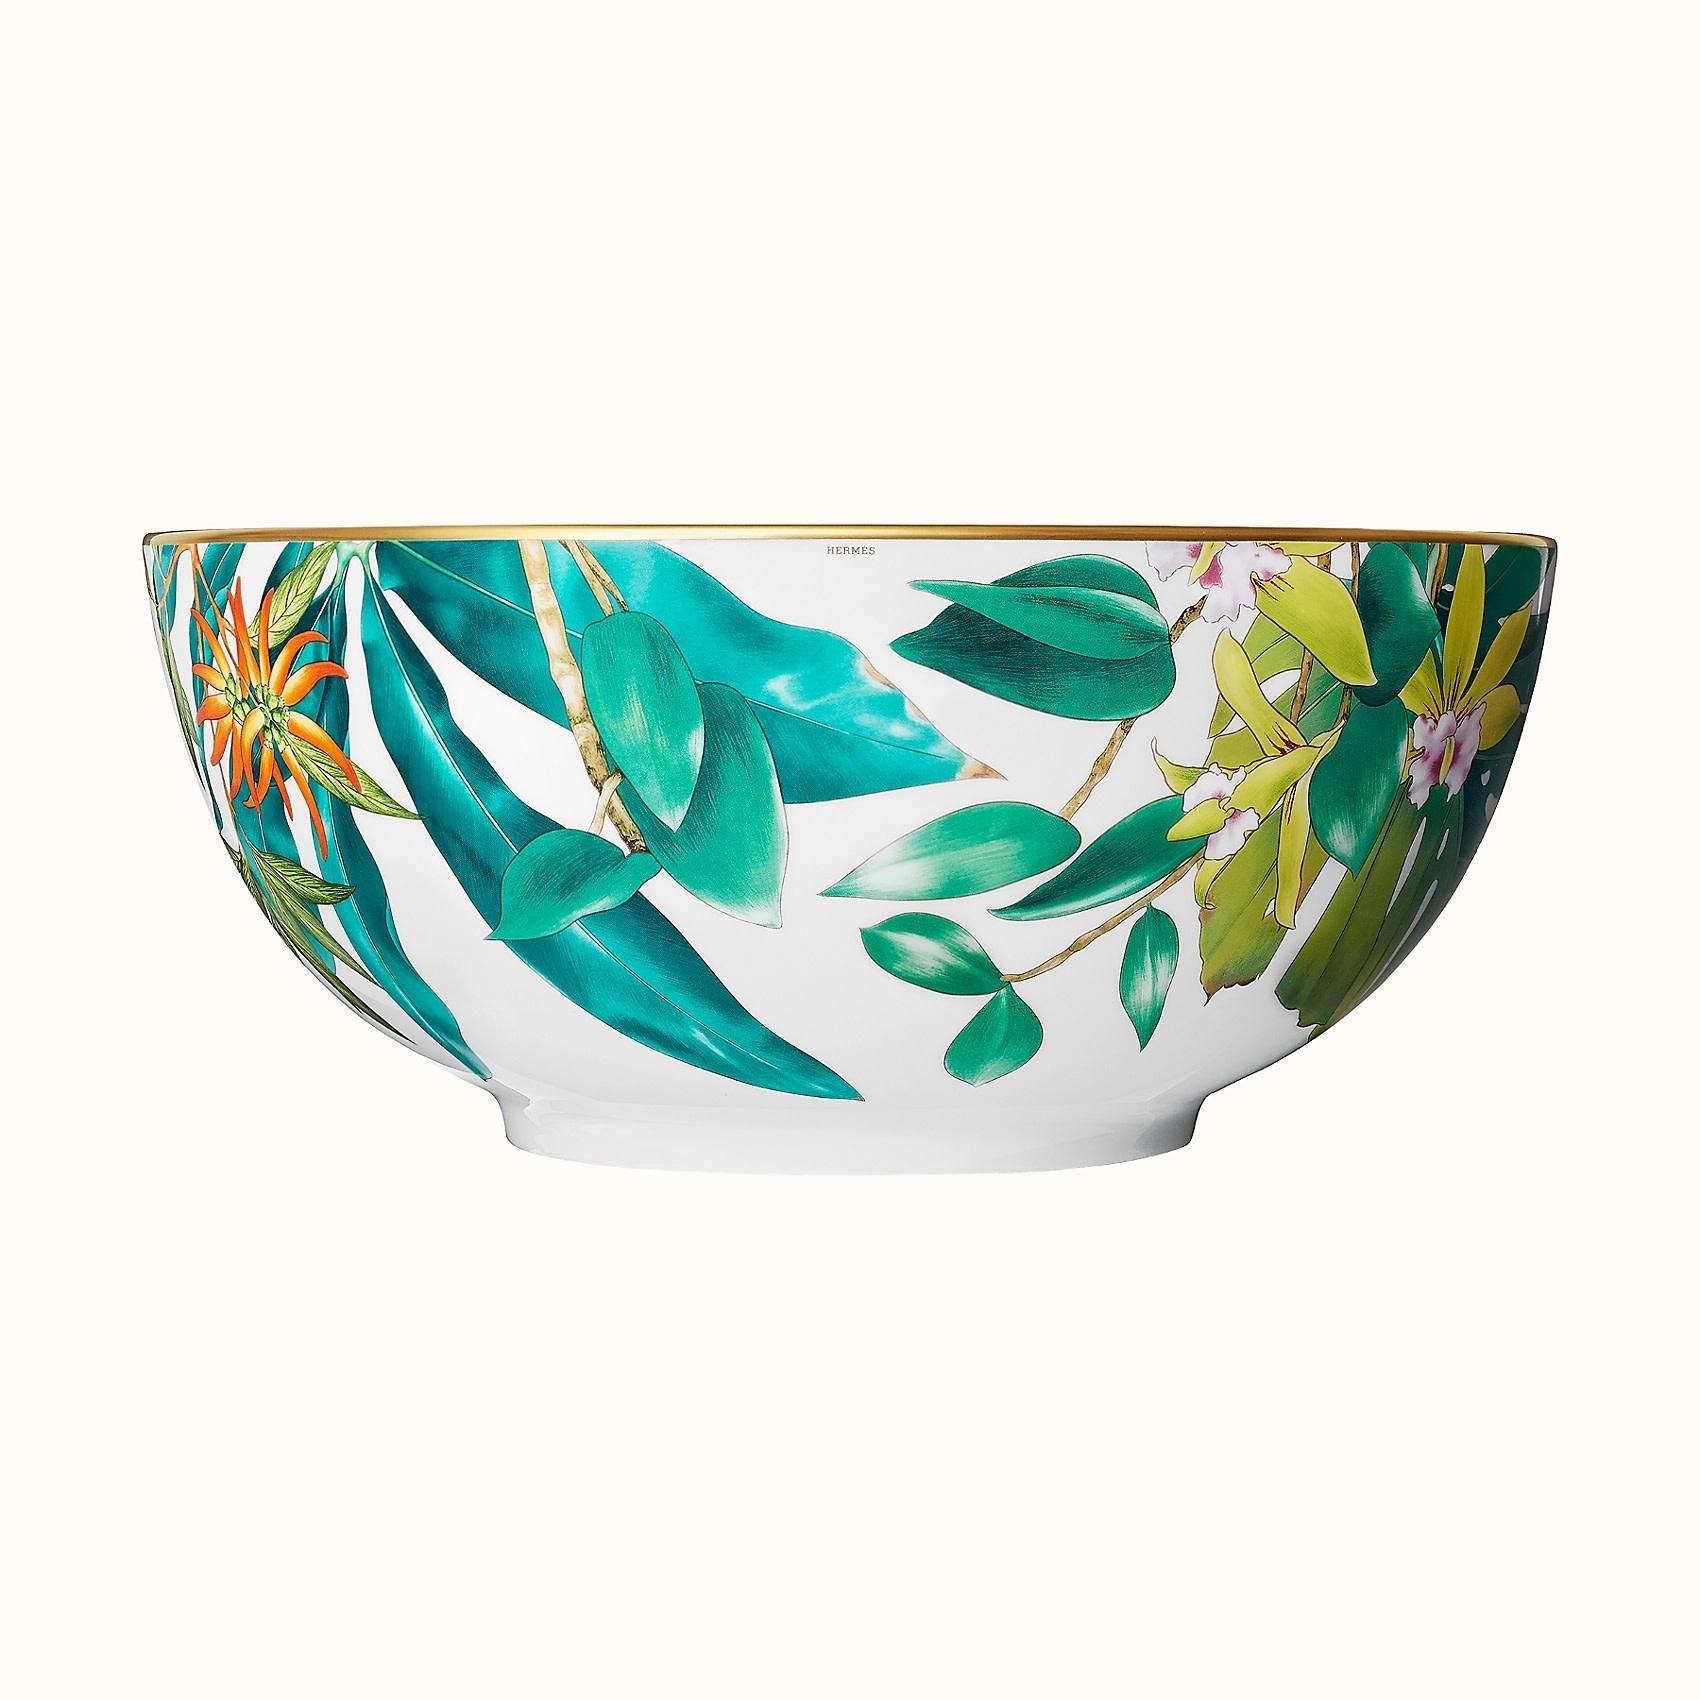 Hermes Passifolia Large Salad Bowl